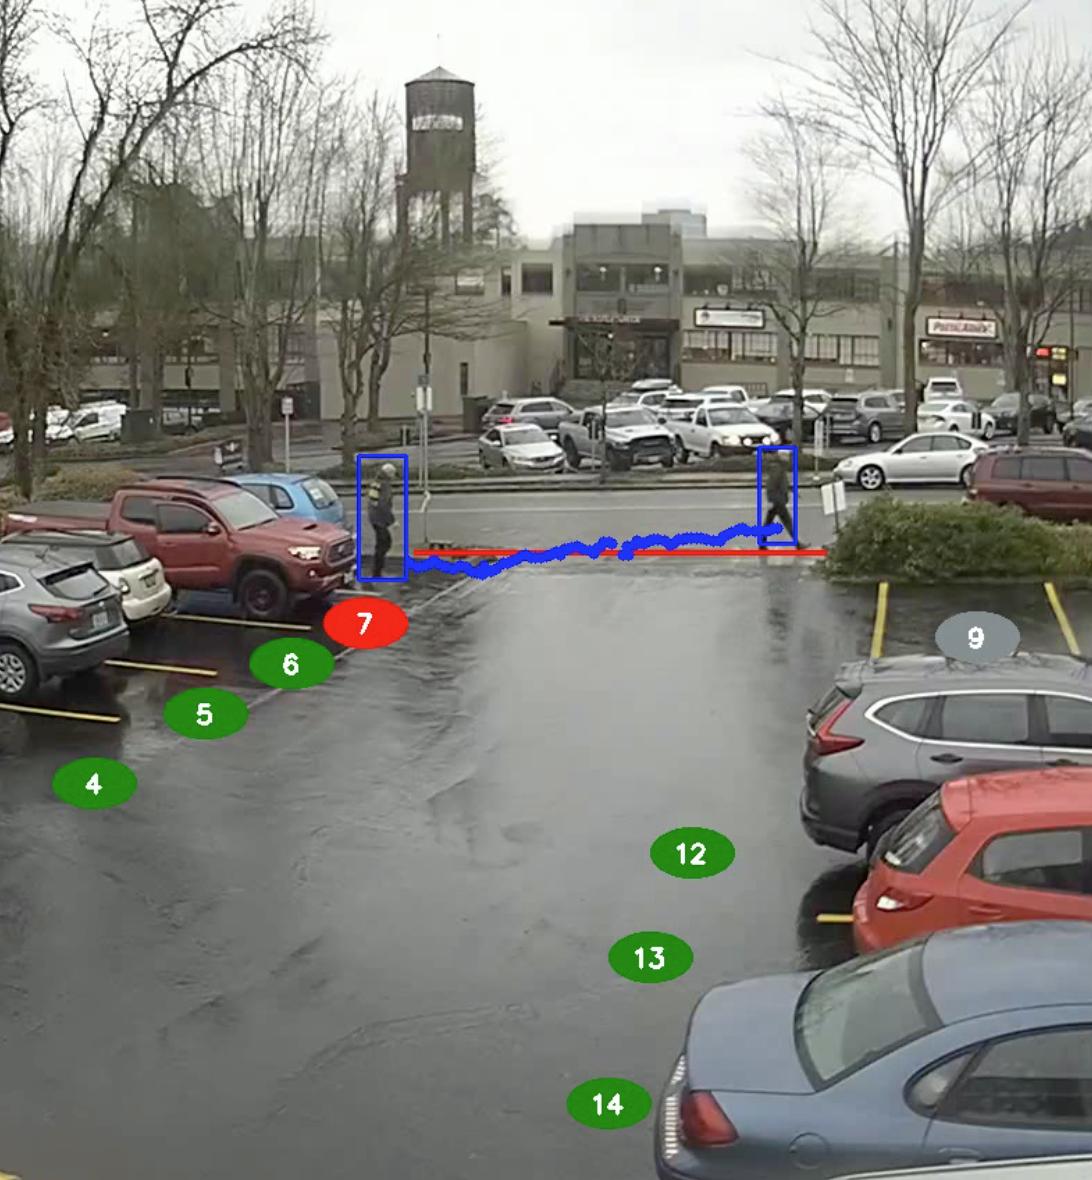 Customer Parking Only / Walk-Off Violation